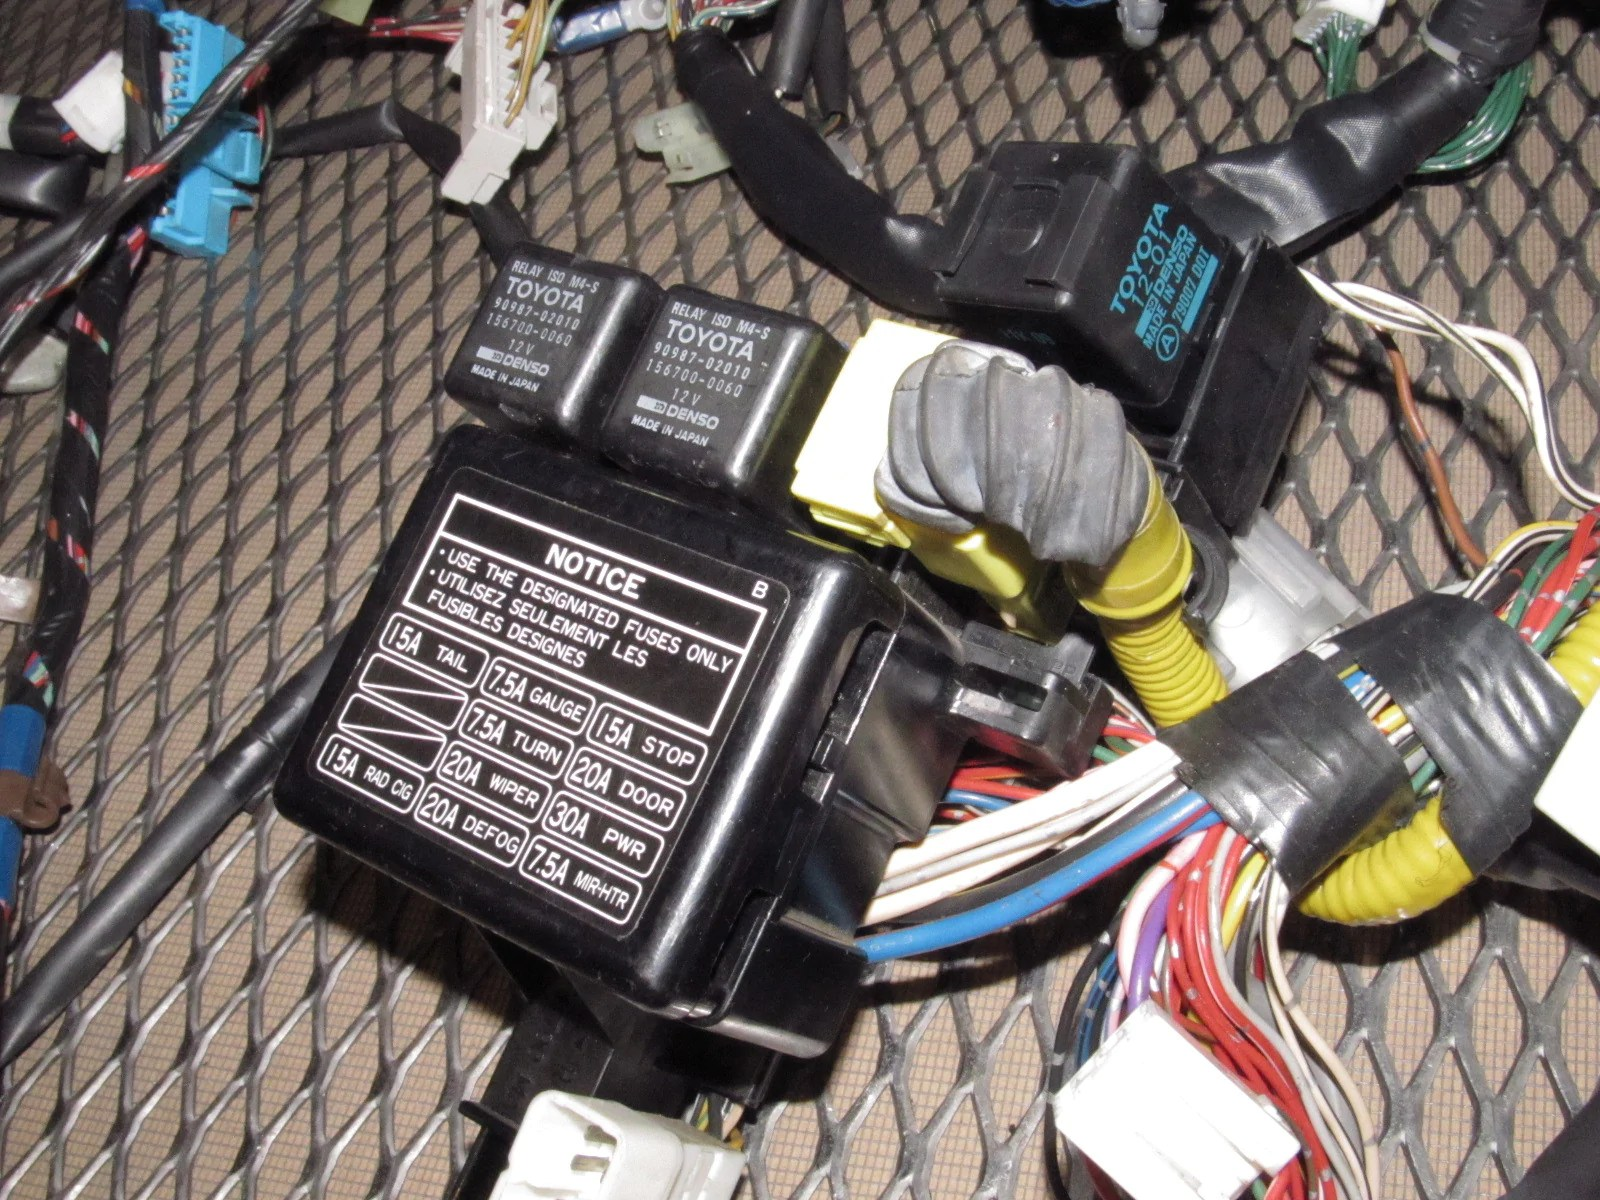 hight resolution of 1993 toyota mr2 wiring harness wiring diagram used 1993 toyota mr2 wiring harness